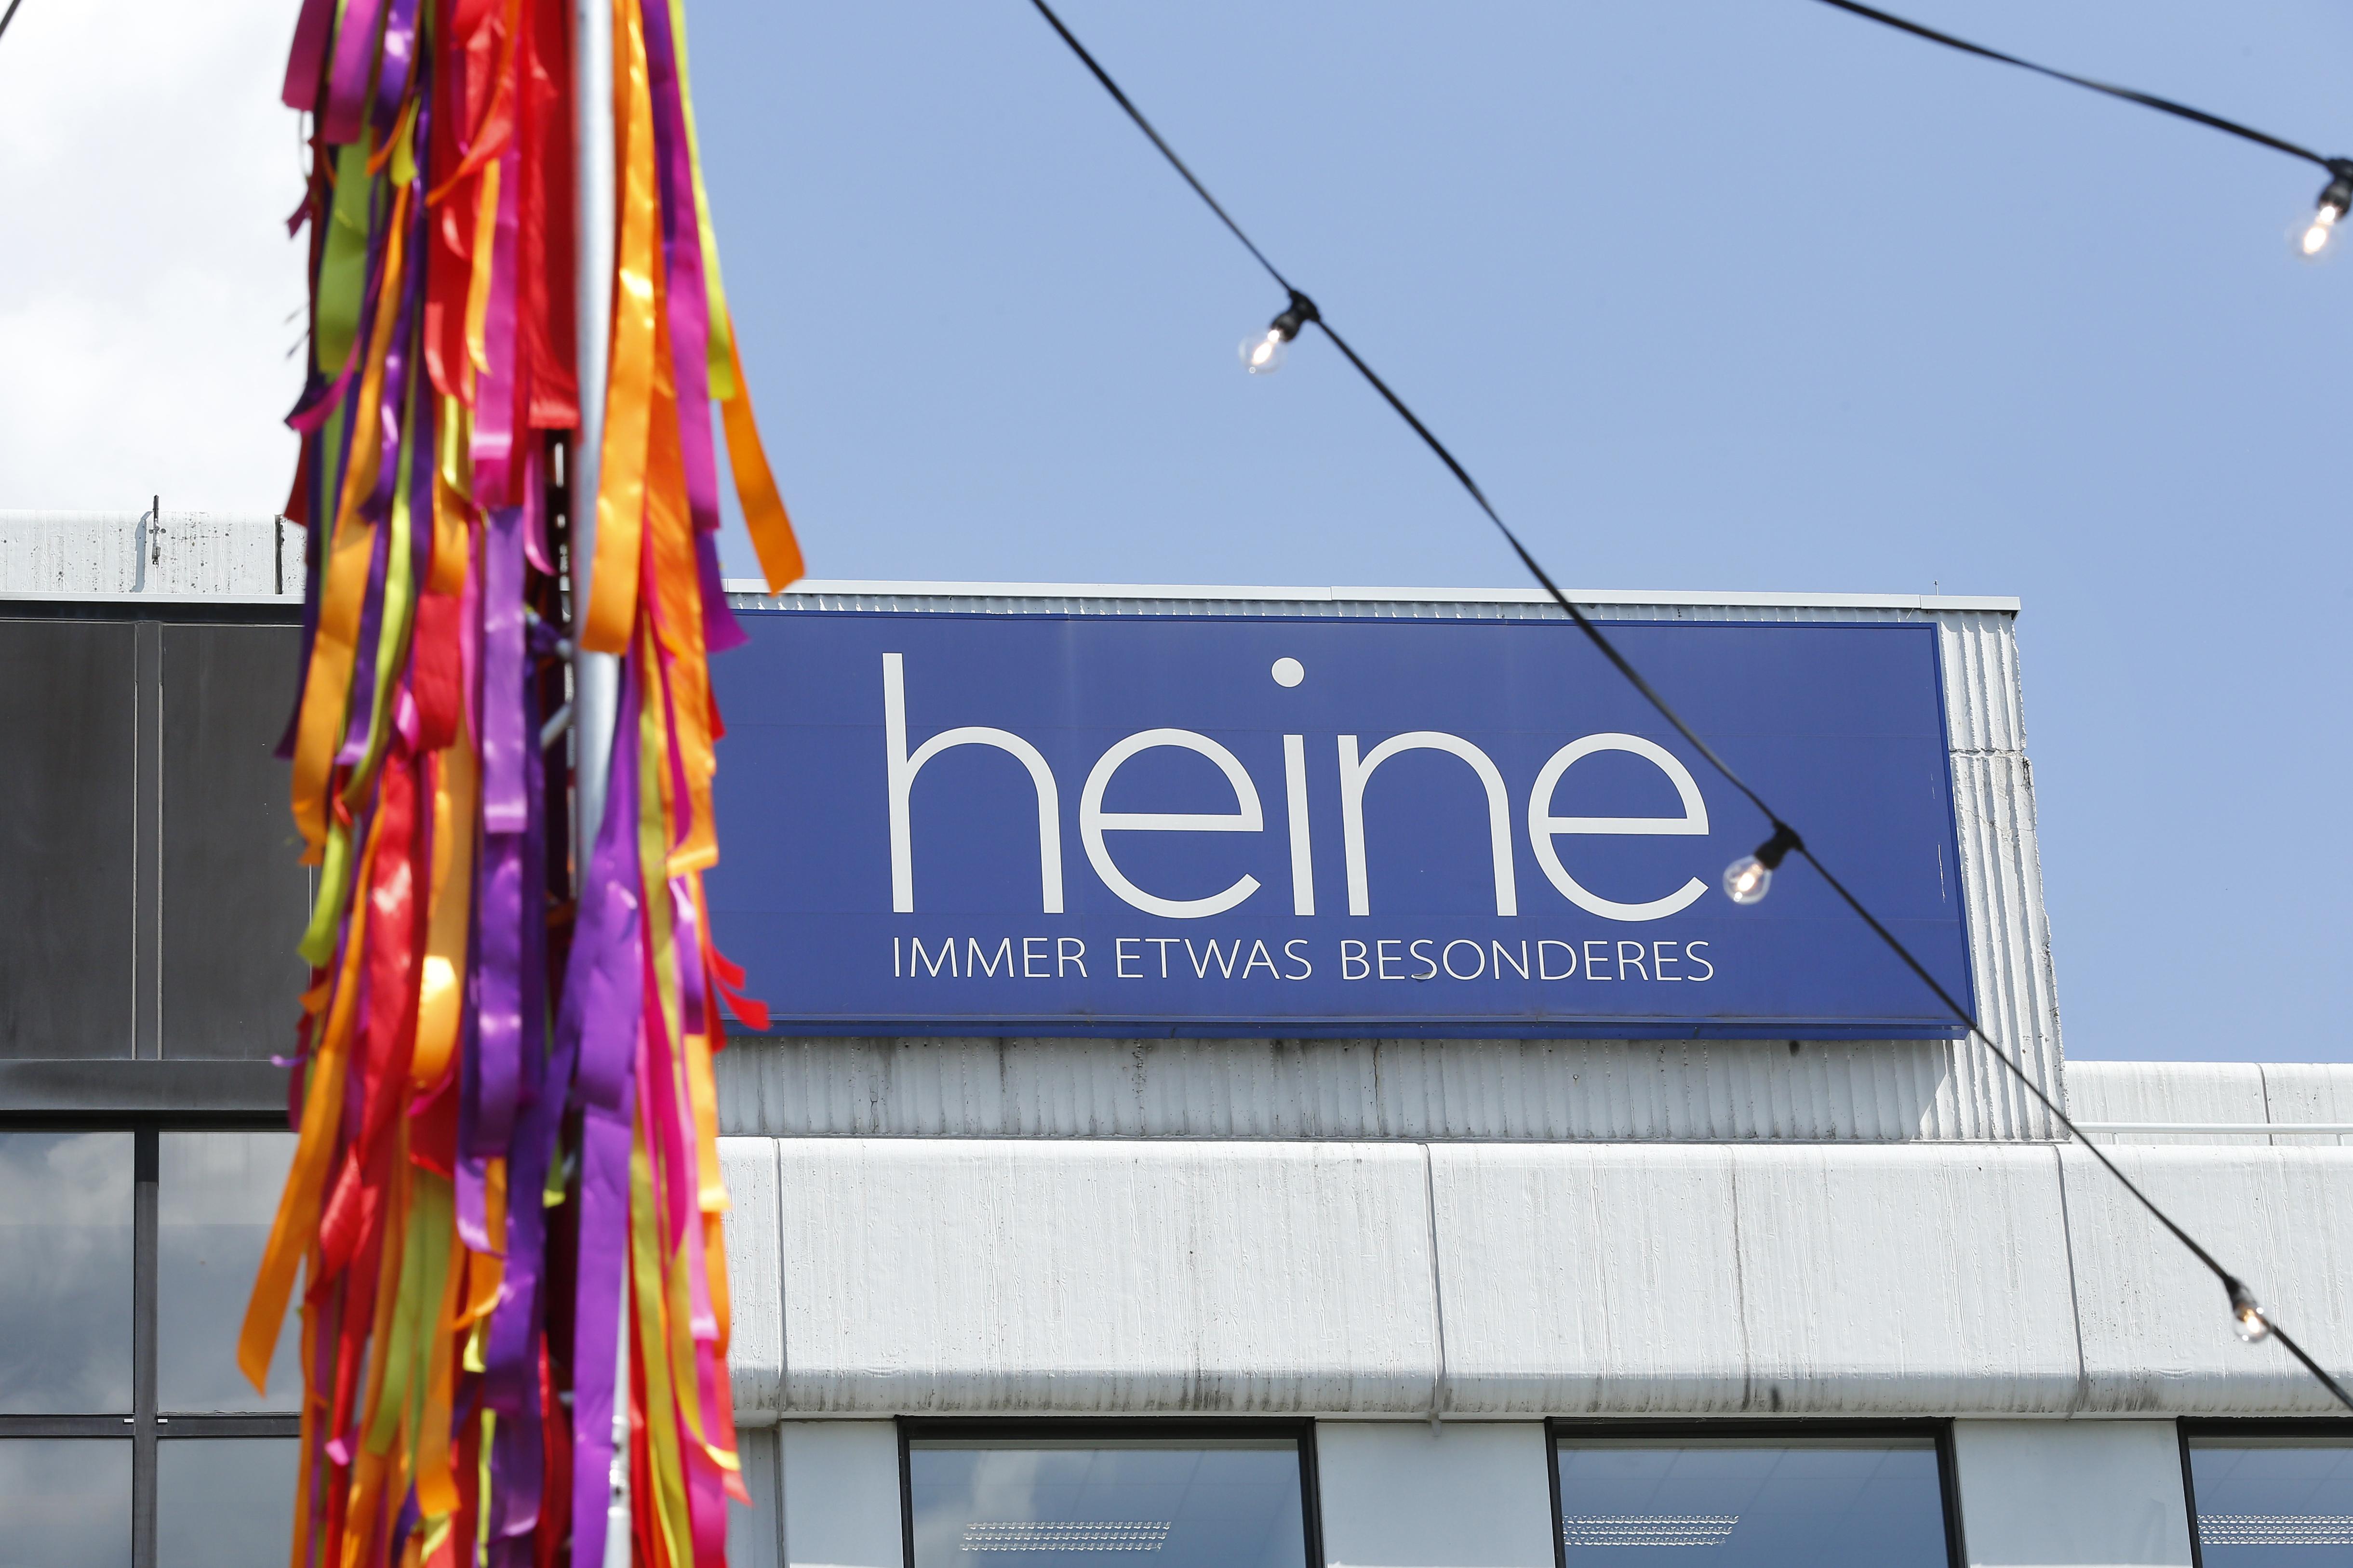 Let's celebrate – Fashion-Festival bei heine